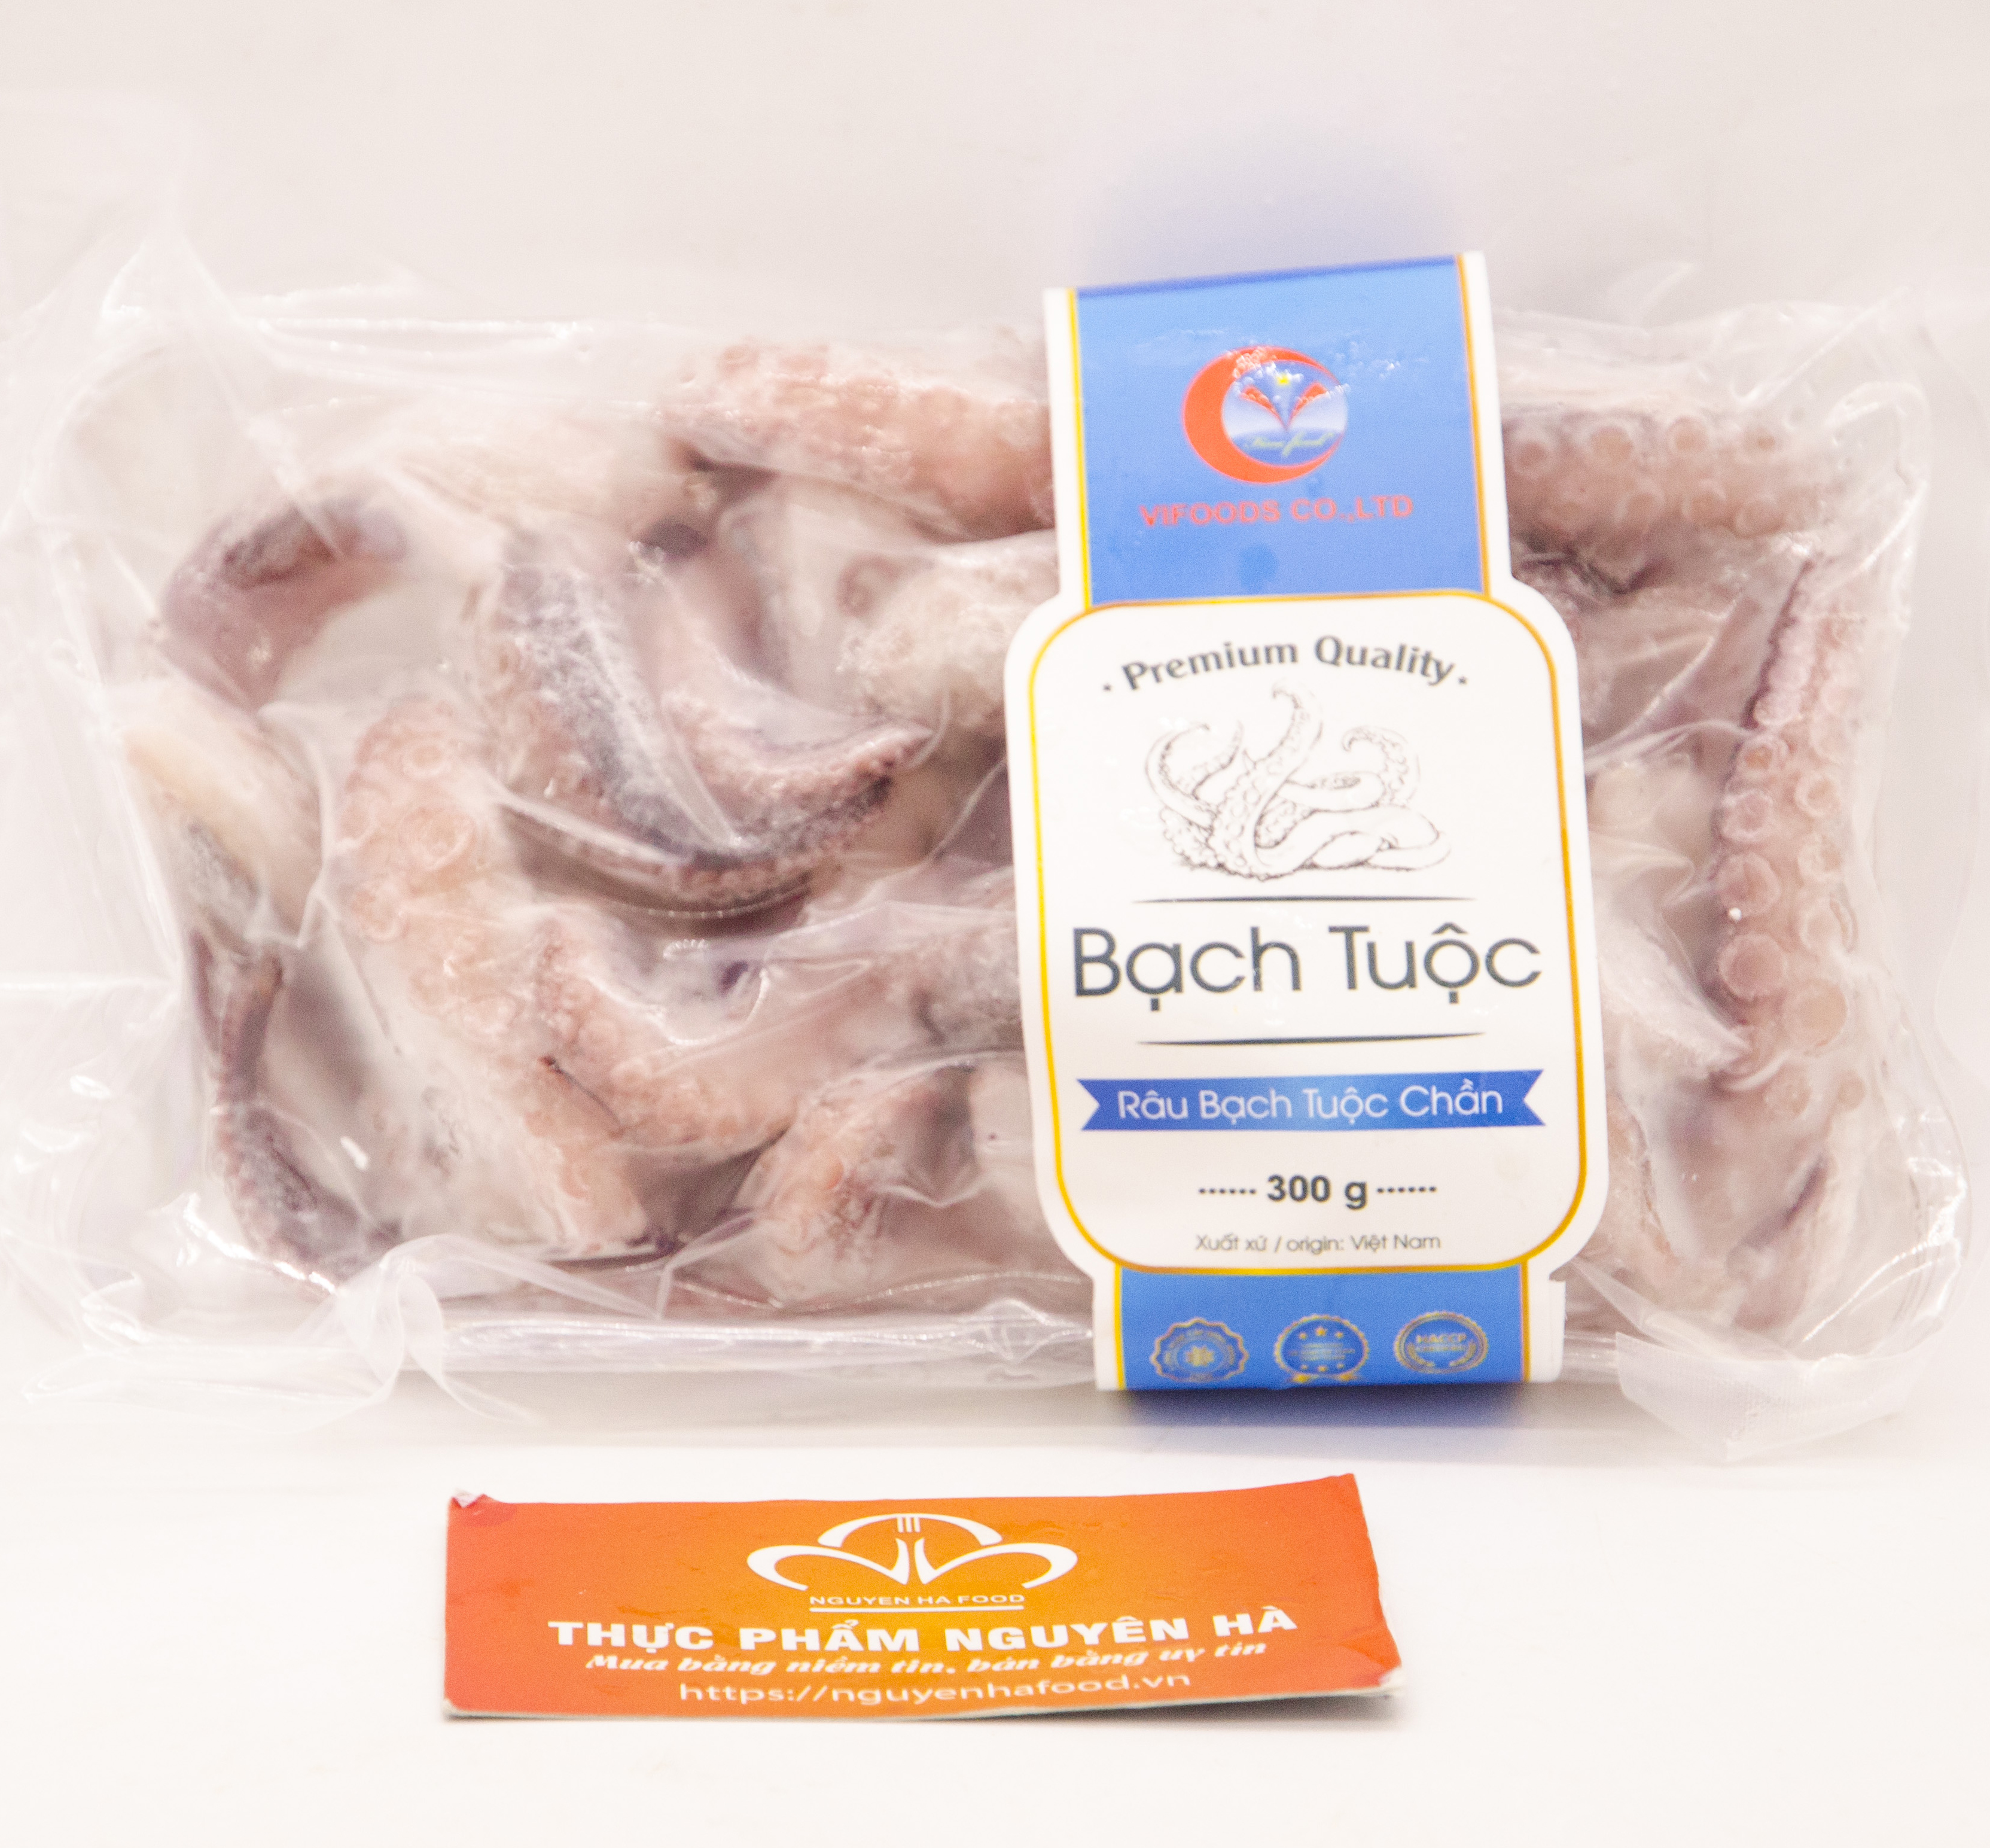 rau-bach-tuot-chan-300g-nguyen-ha-food